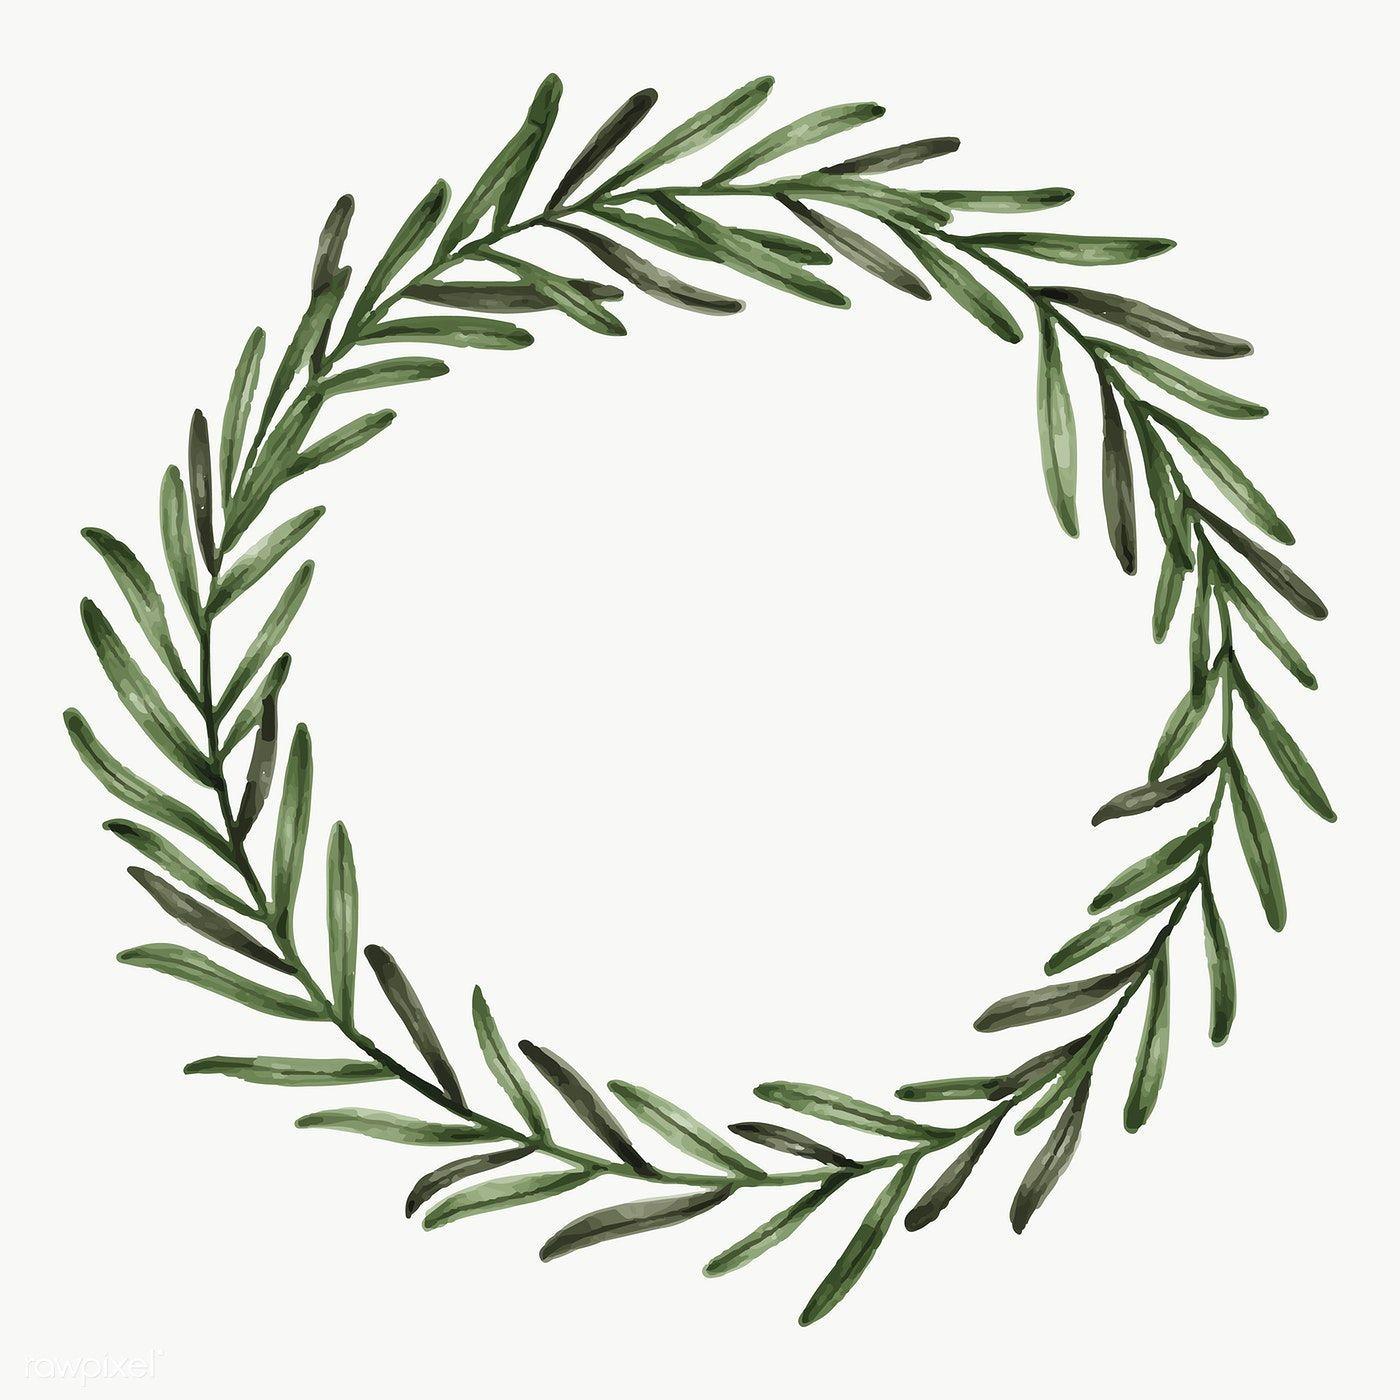 Wedding Invitation Wreath Garland Clip Art Green Leaf Garland Png Is About Is About Green Leaf Listras Cor De Rosa Ideias Para Logotipos Molduras Casamento